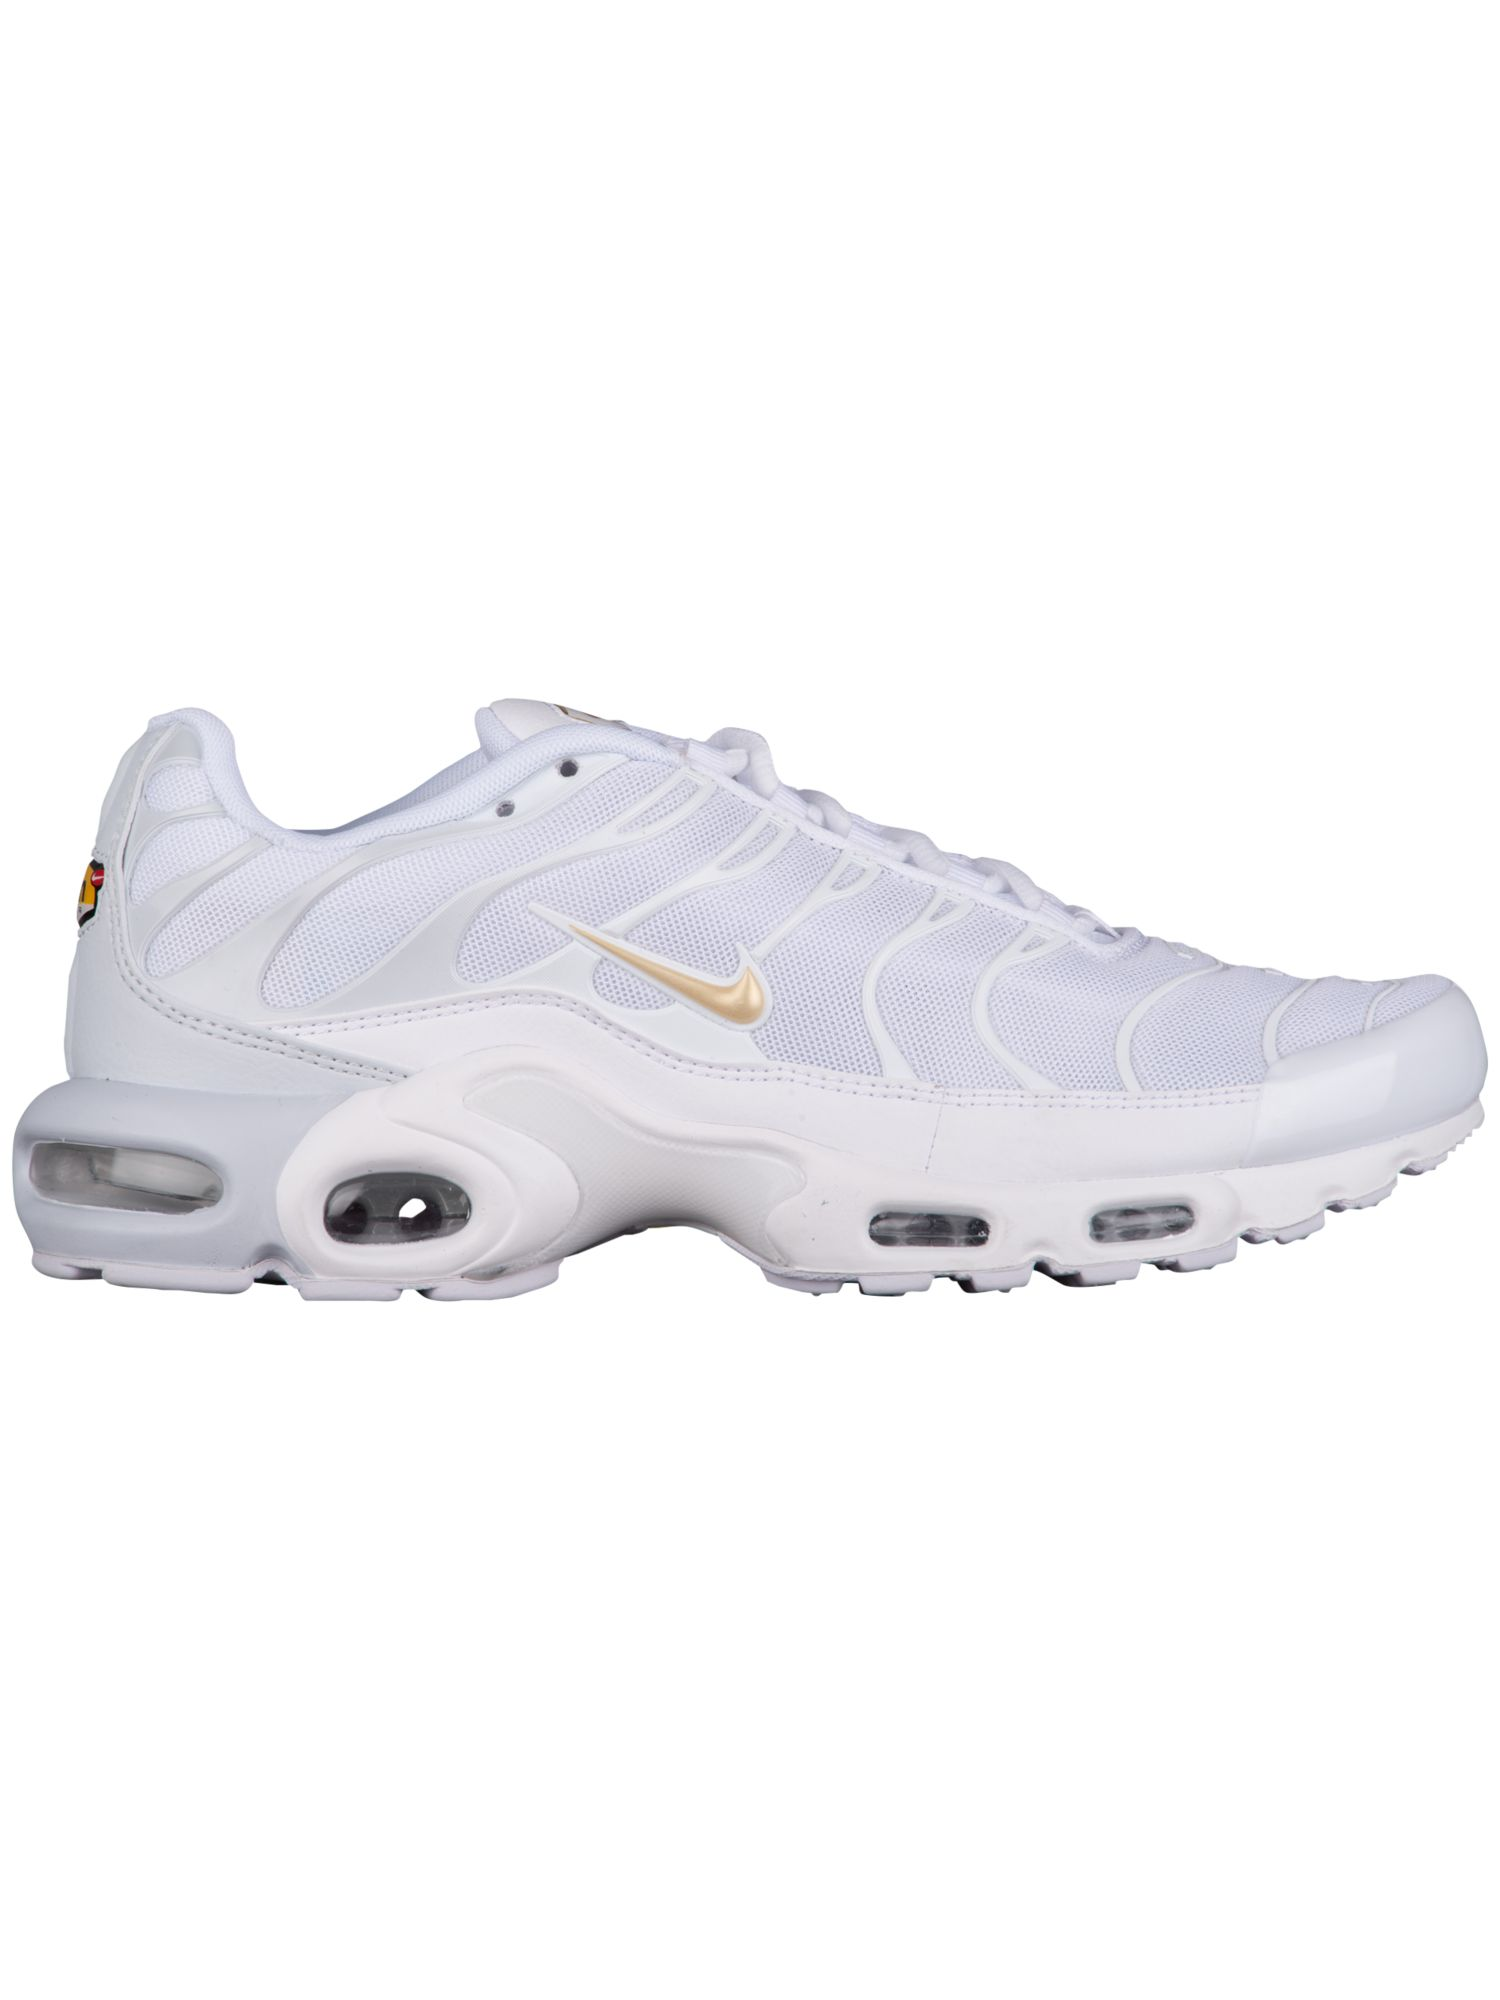 super popular 6f1a8 c73f7 Nike Air Max Plus Men's Running Shoes Pure Platinum/Metallic Gold/White